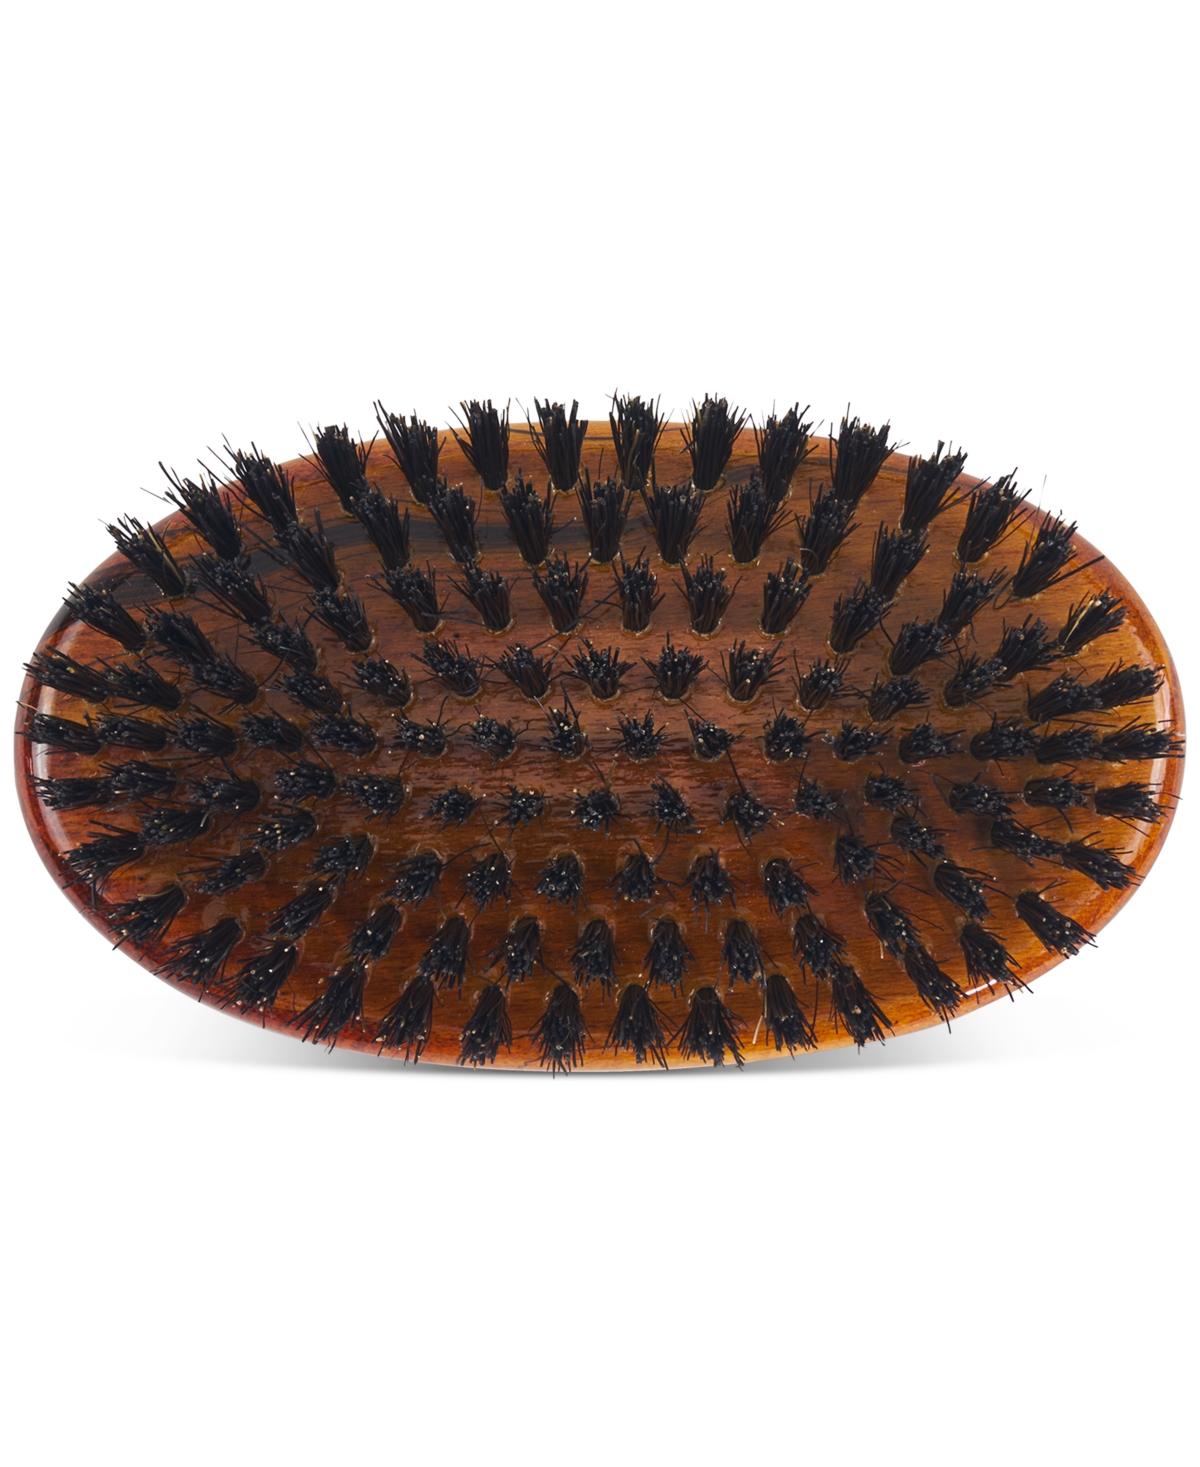 Caswell Massey F. Hammann Military Hair Brush